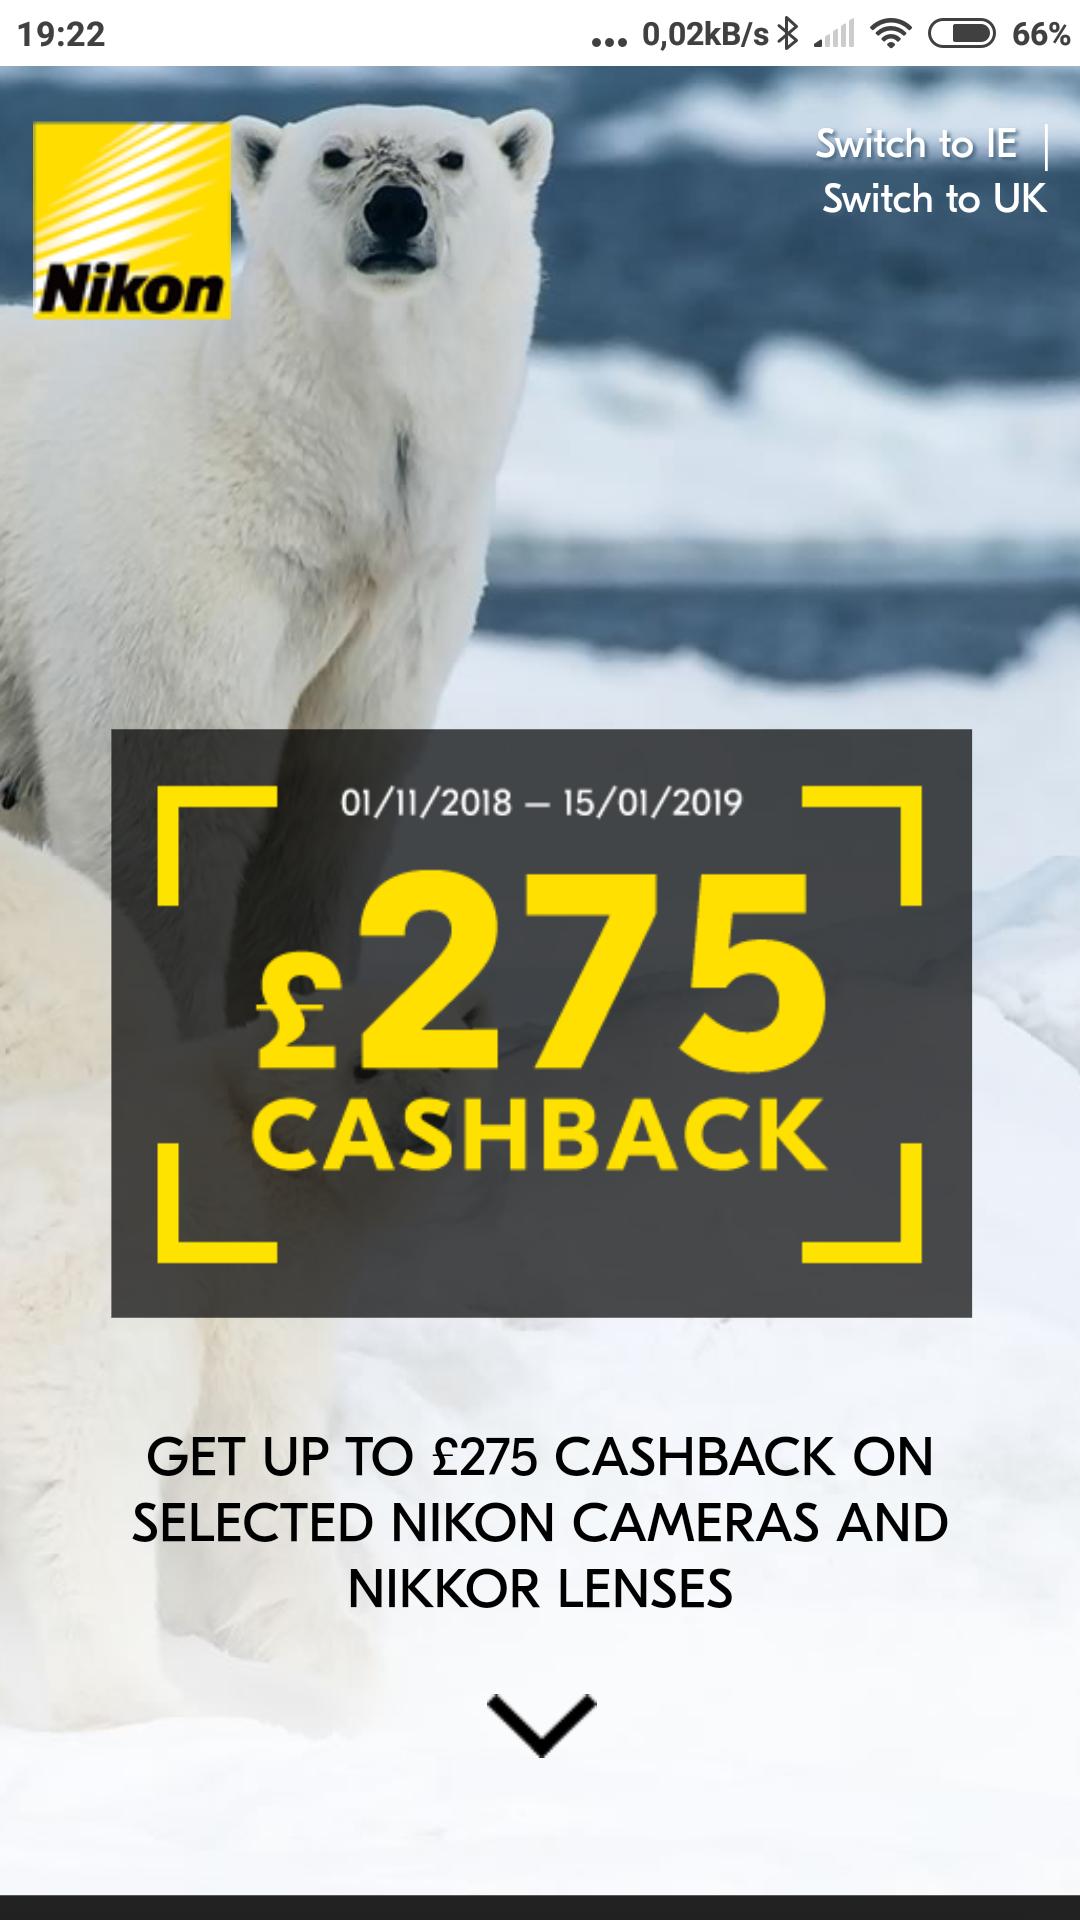 Nikon cashback Winter 2018 - up to £275 cashback on seleted Nikon cameras and lenses